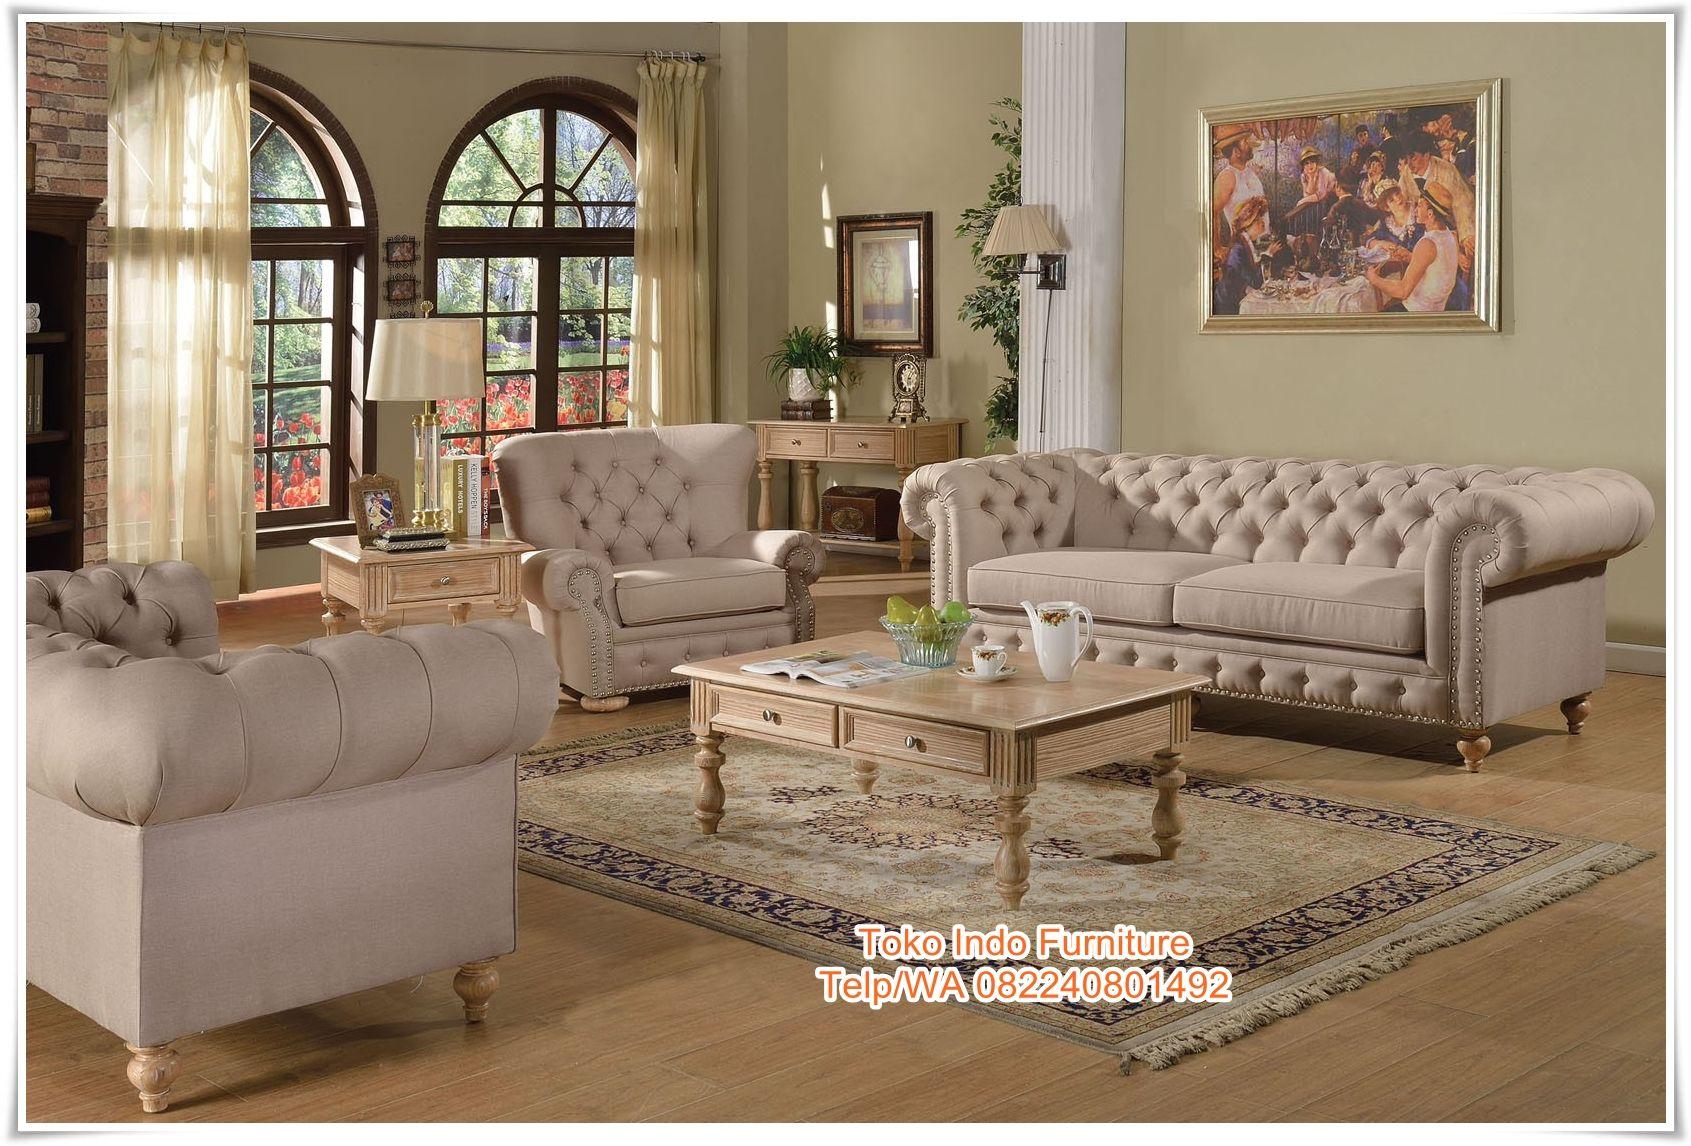 Kursi Sofa Empuk Ruang Tamu Http Www Tokoindofurniture Com Kursi Sofa Empuk Ruang Tamu Html Formal Living Room Sets Living Room Sets Luxury Living Room Living room piece sets